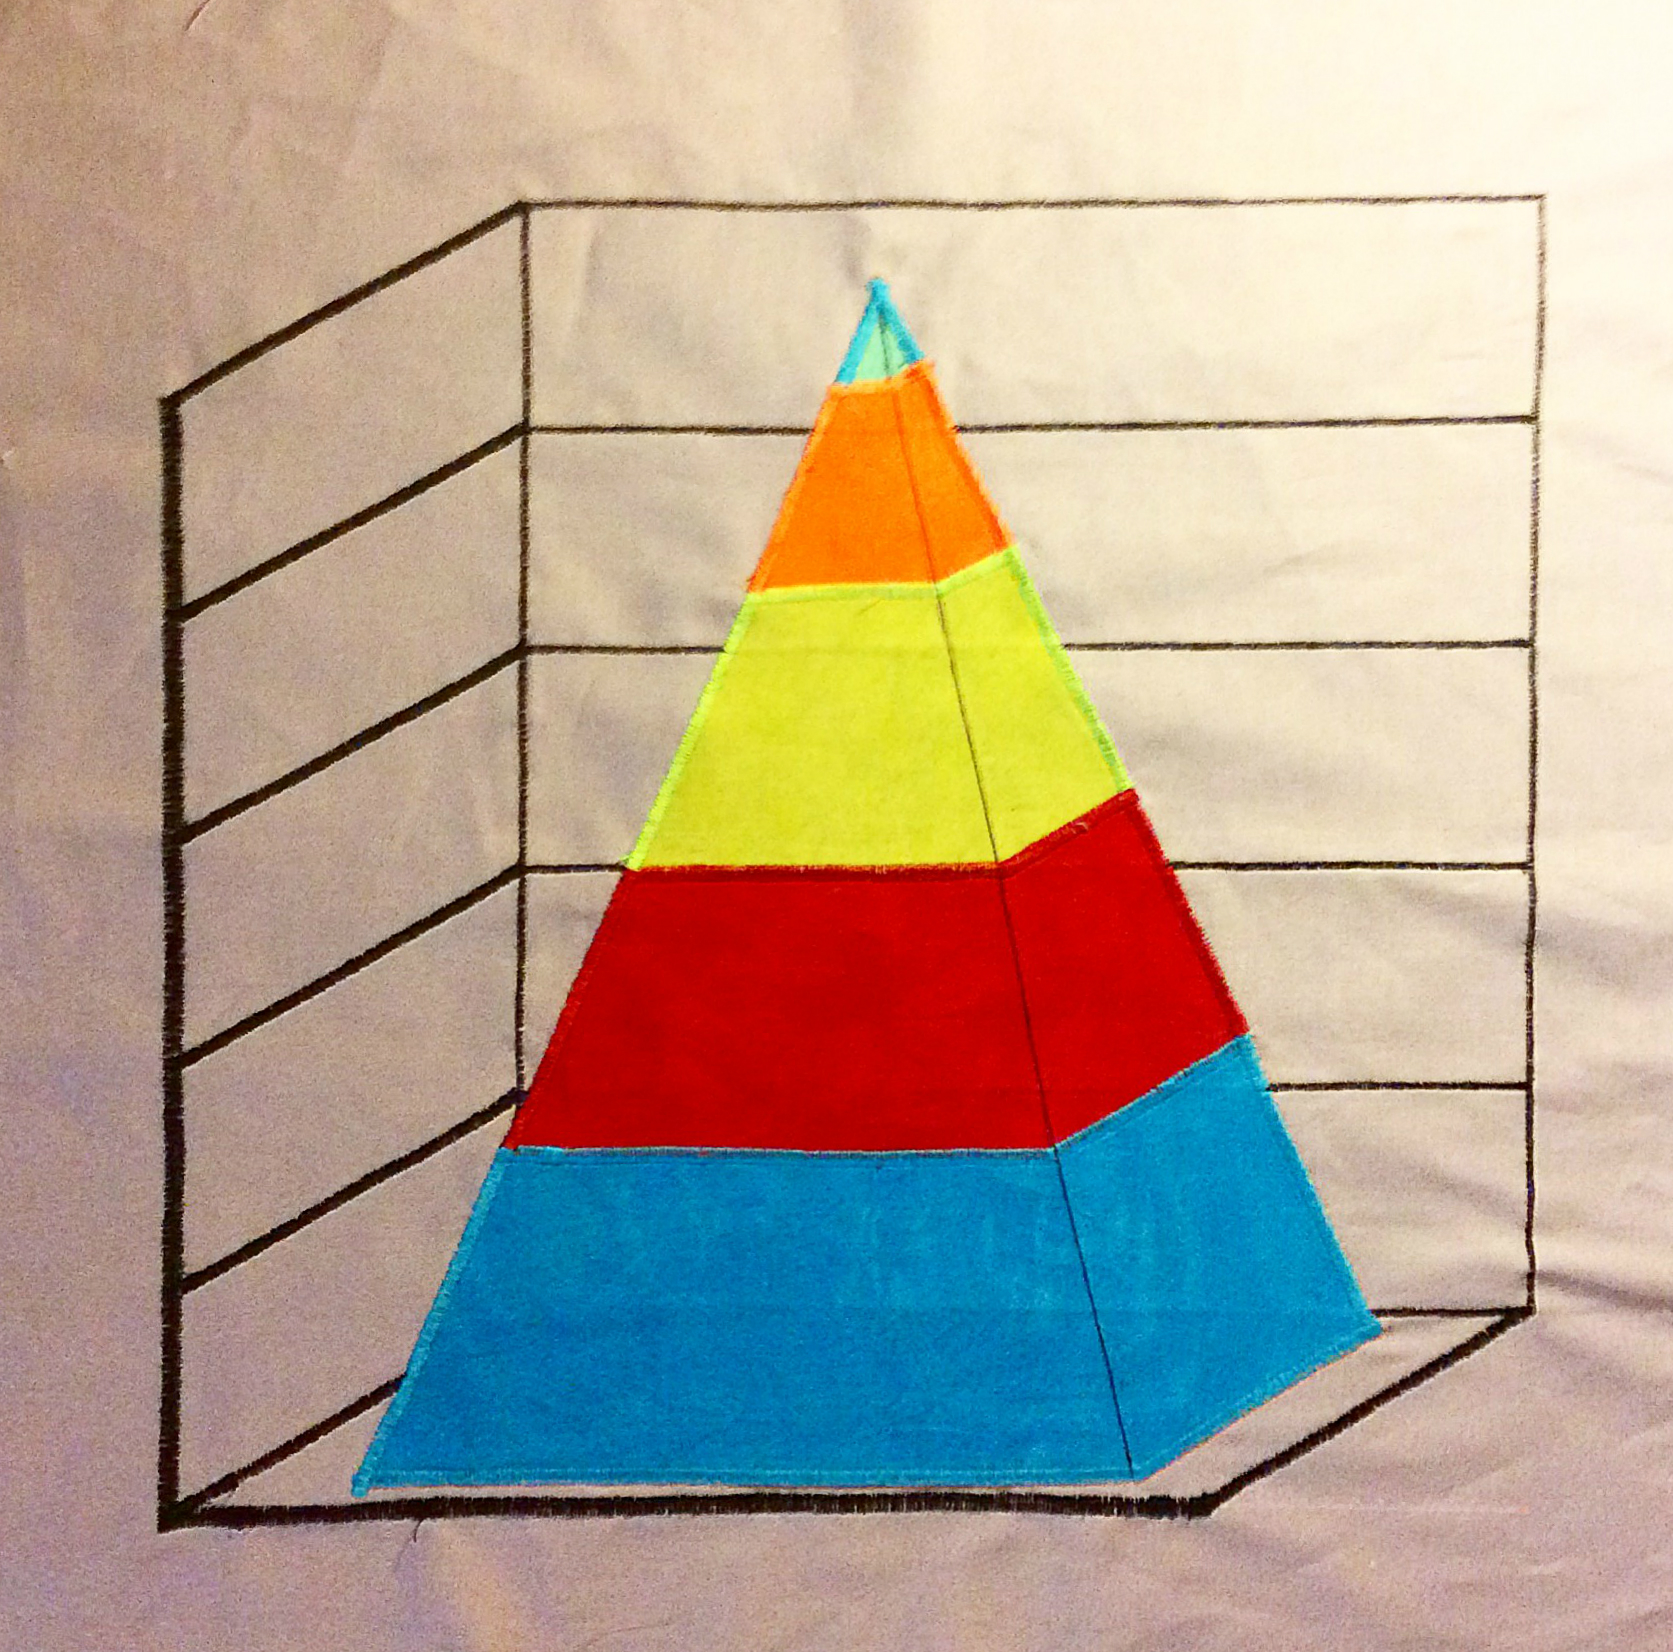 Bad Population Pyramid (in progress)